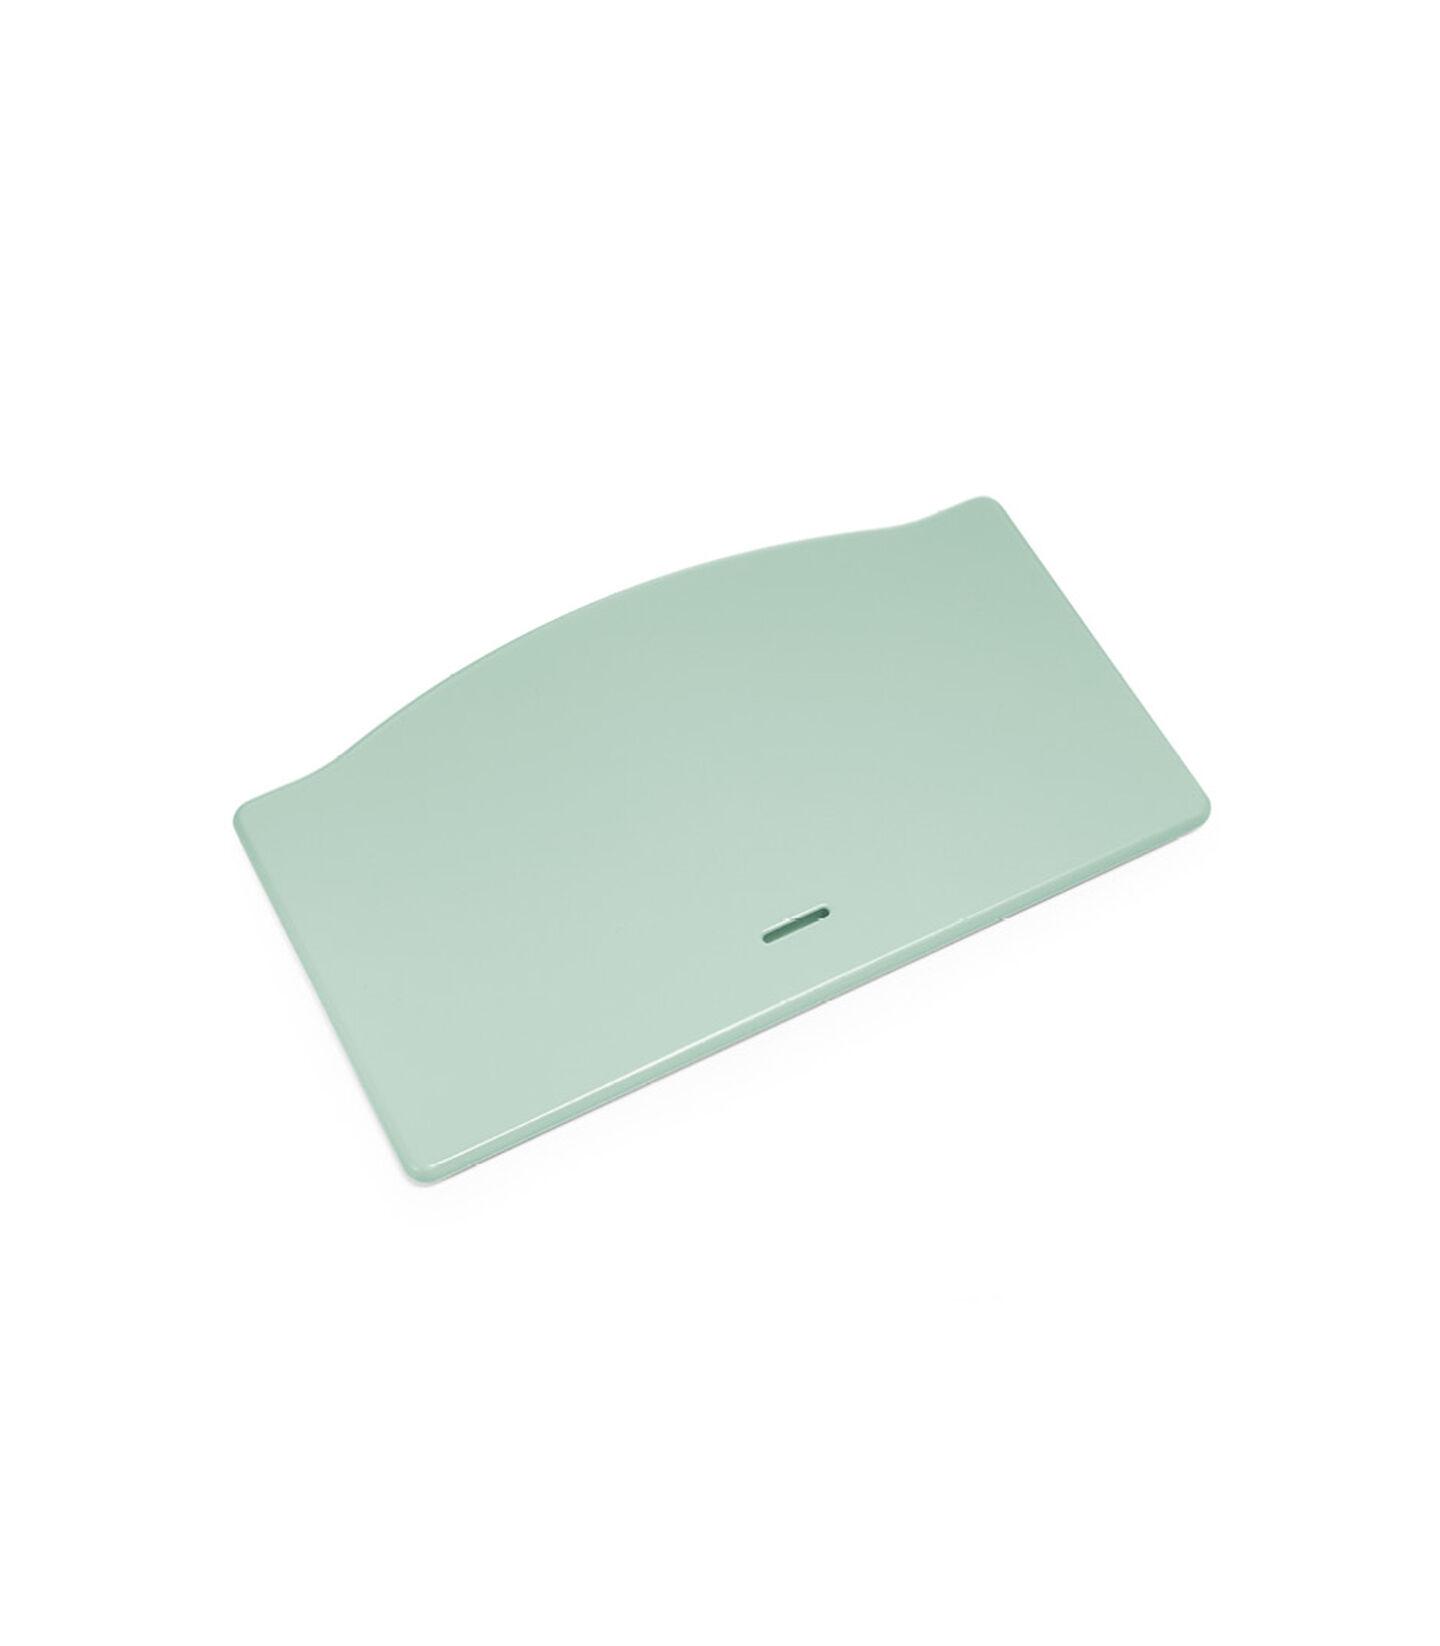 Tripp Trapp® sitteplate Soft Mint, Soft Mint, mainview view 1